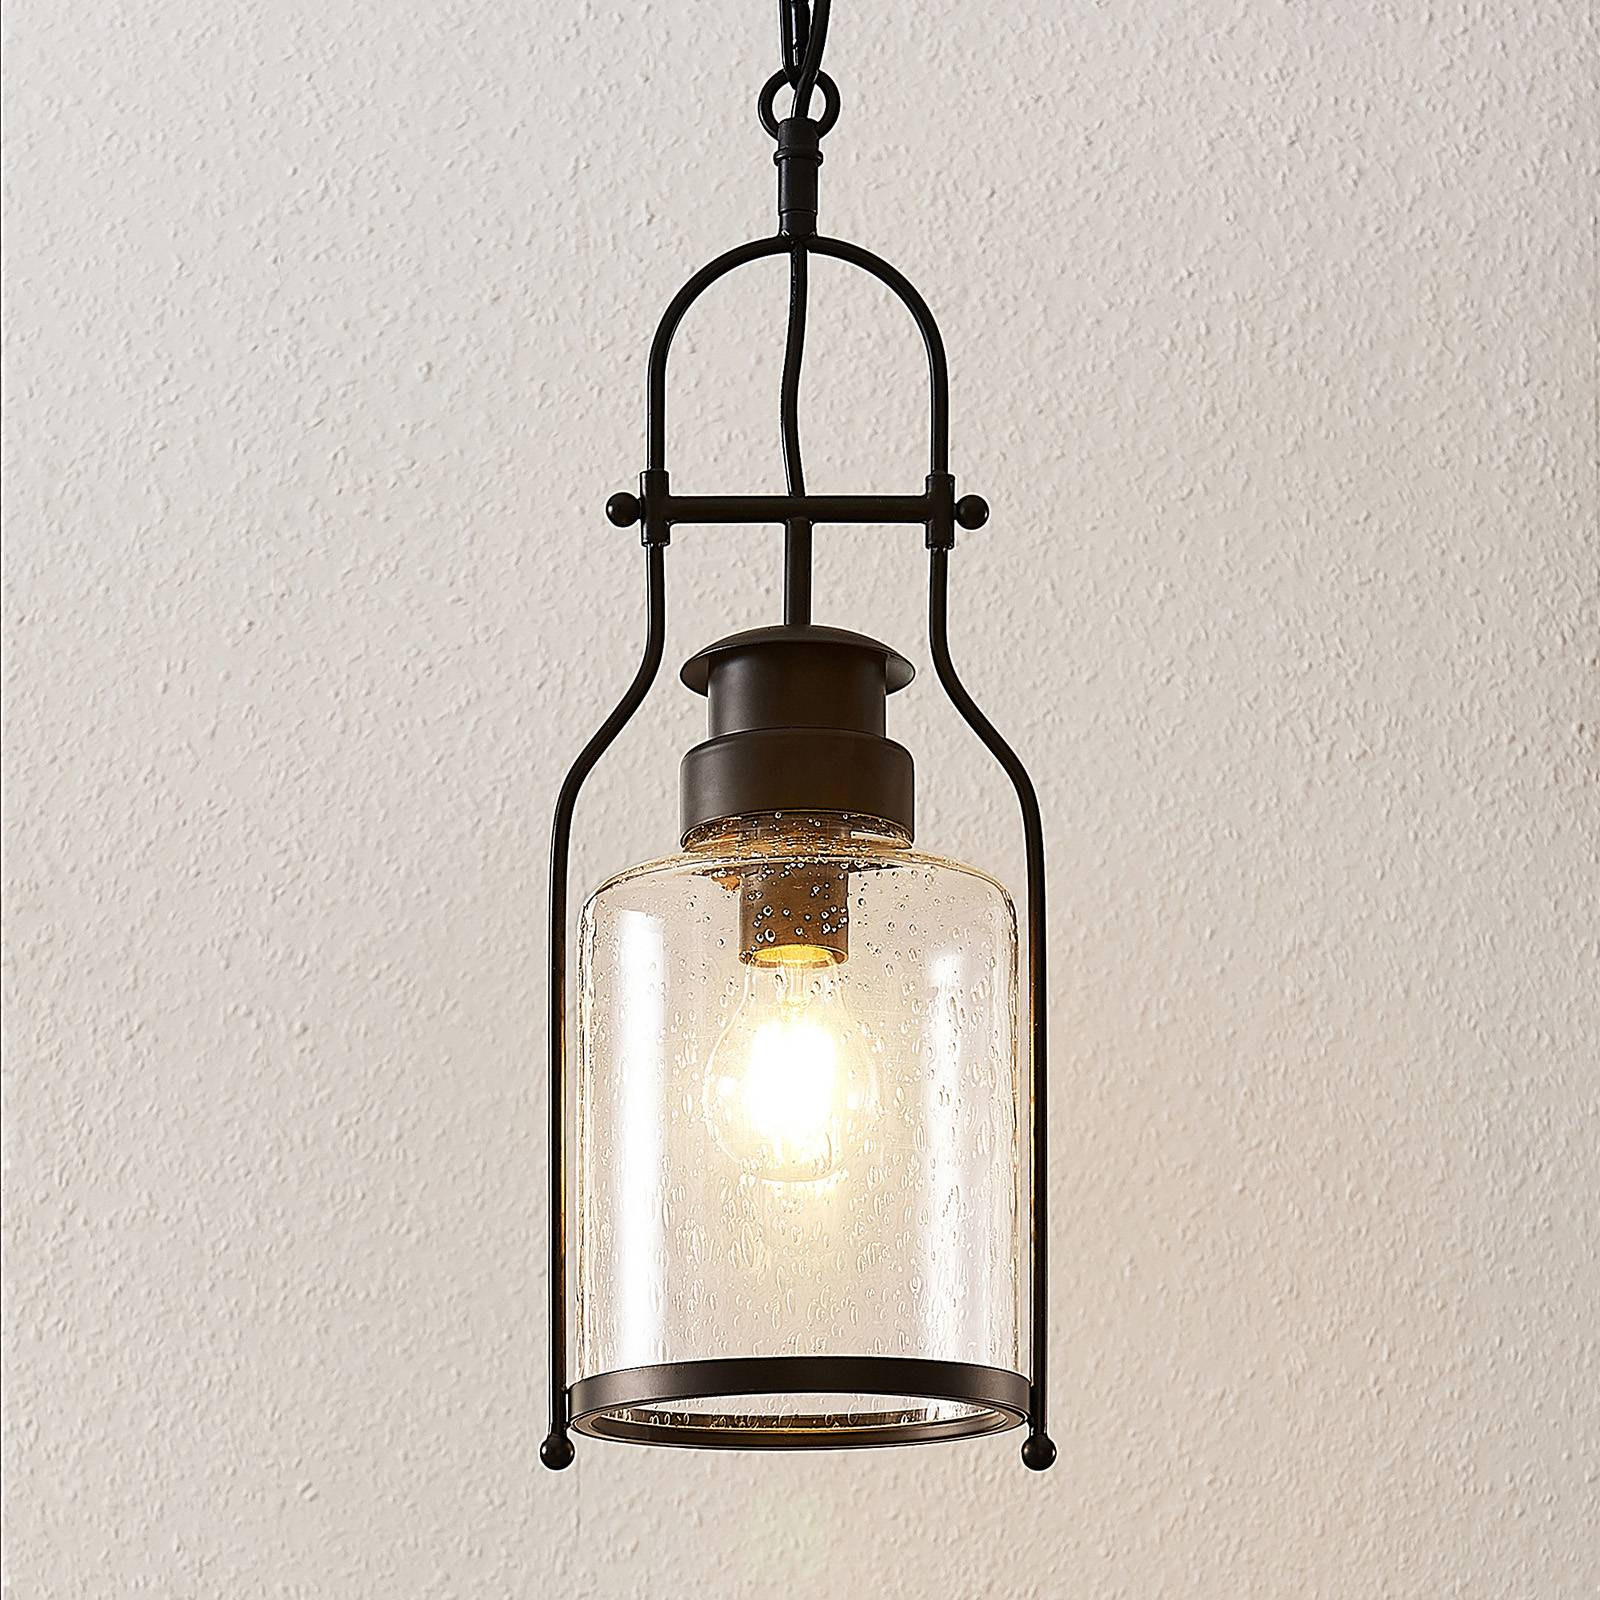 Lindby Rozalie hanglamp, lantaarn, zwart